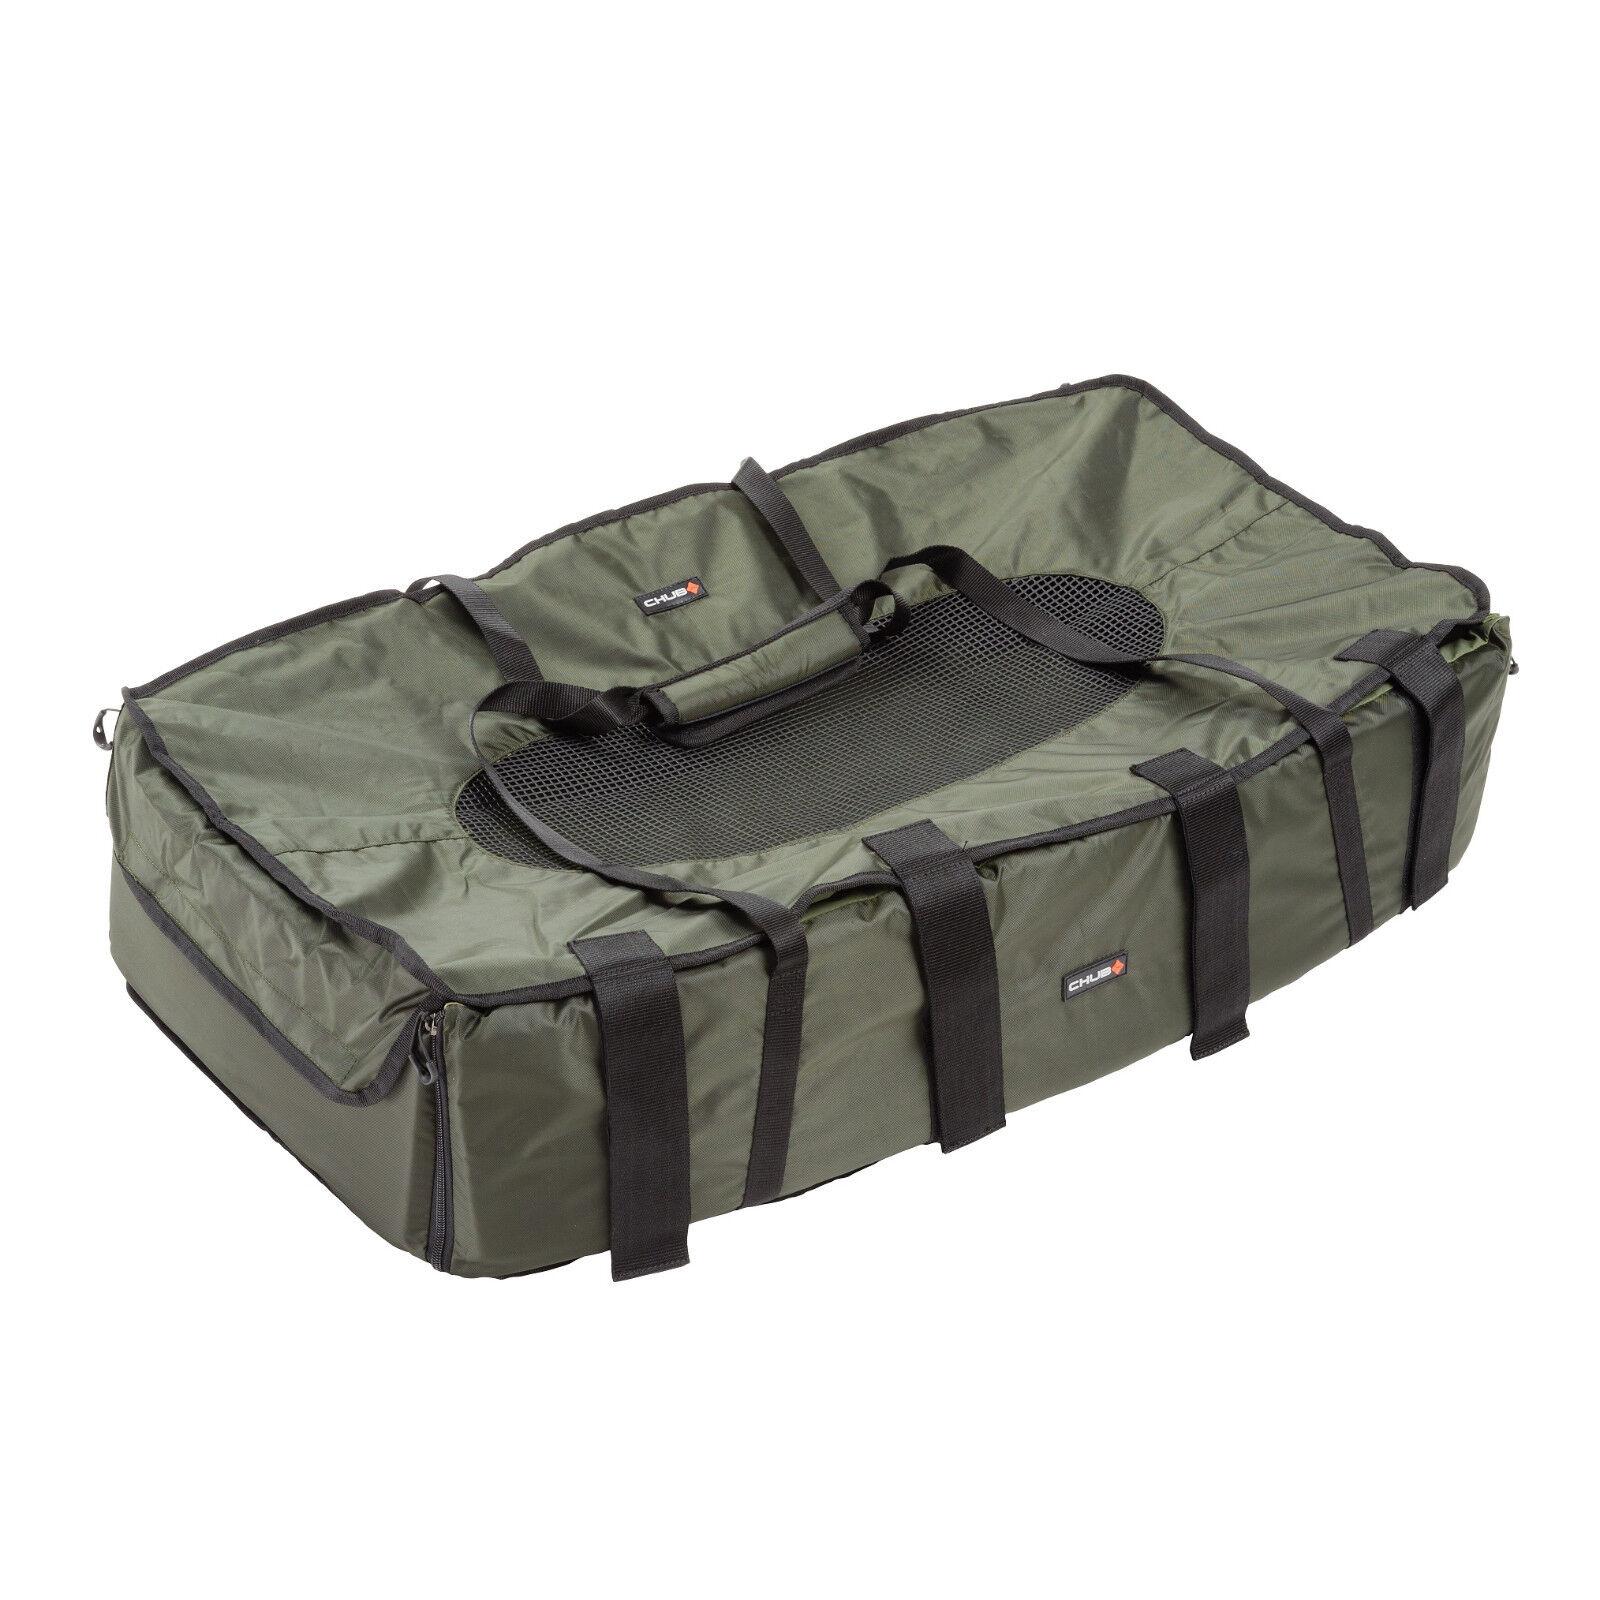 Chub X-Tra Protection Cradle XL 1404667 NEW2017 Abhakmatte Unhookingmat Matte